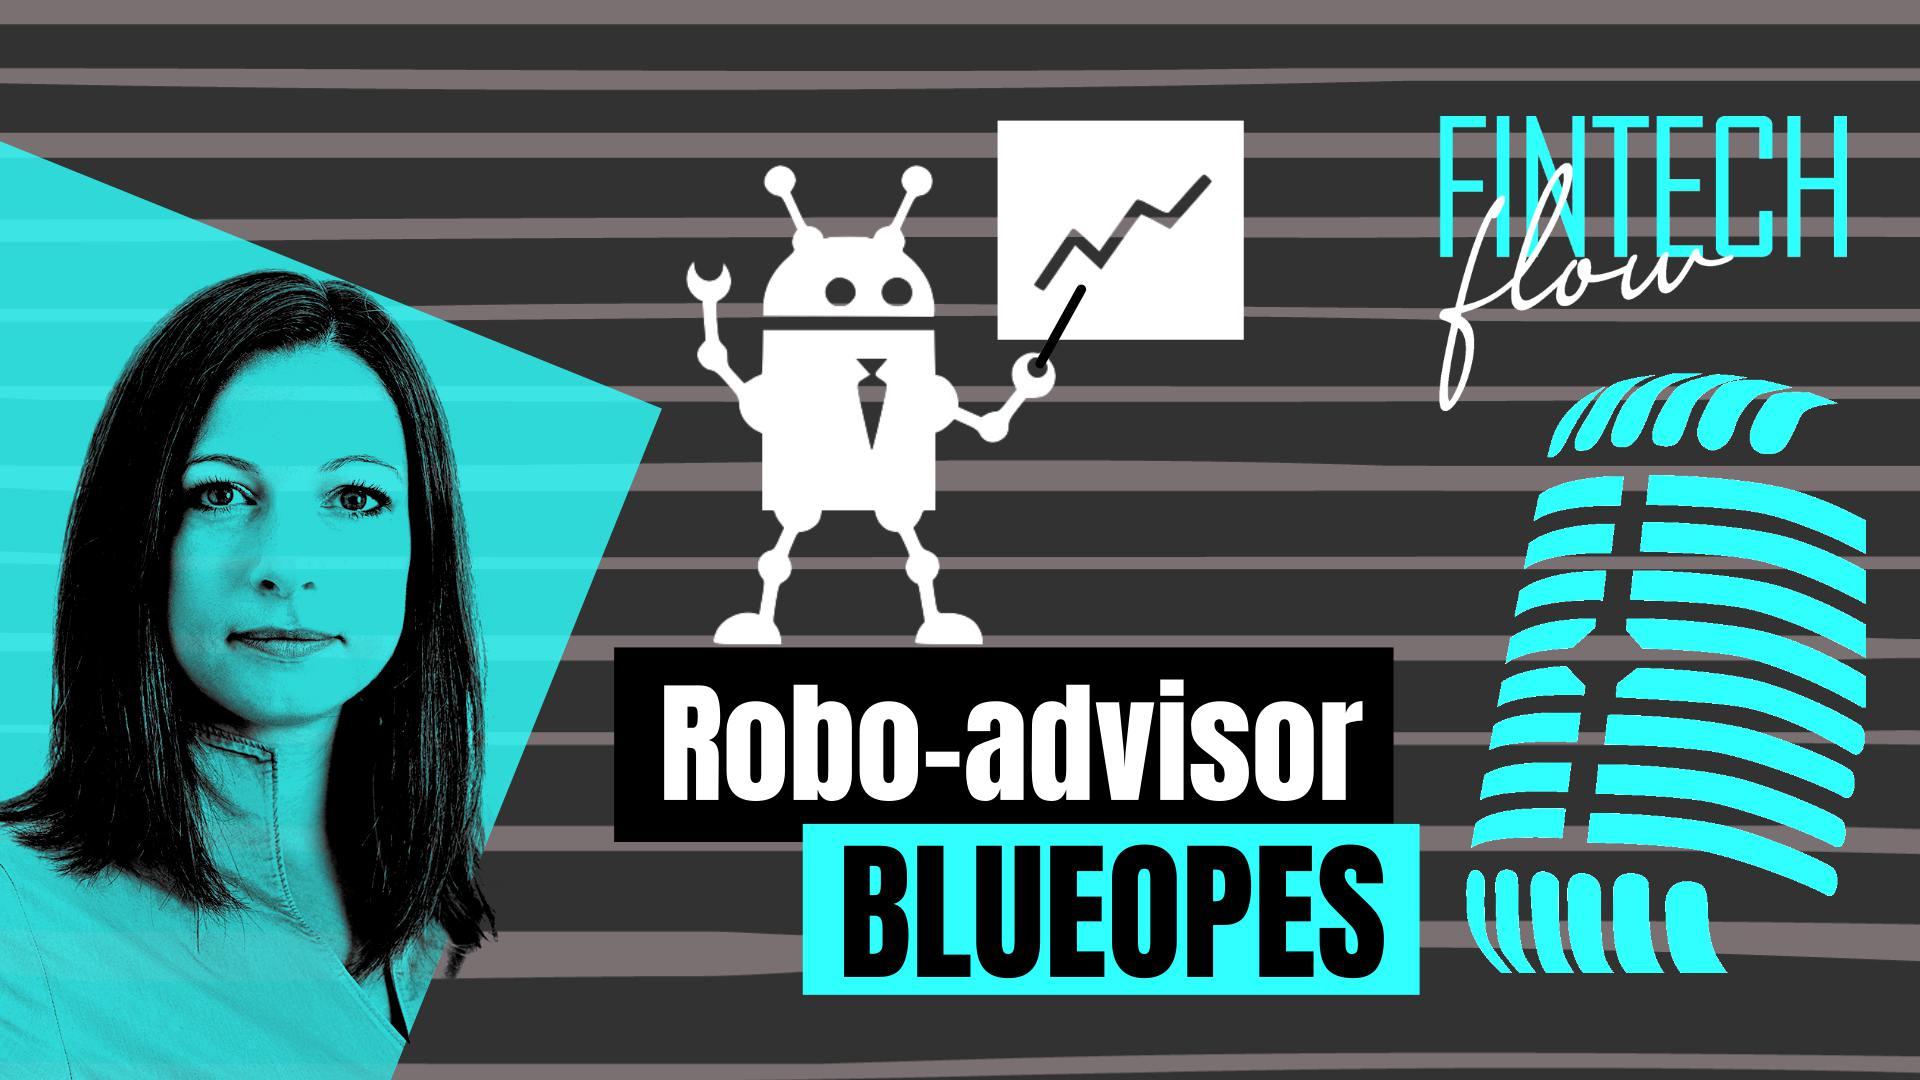 fintechflow-design-posdcast-2-blueopes